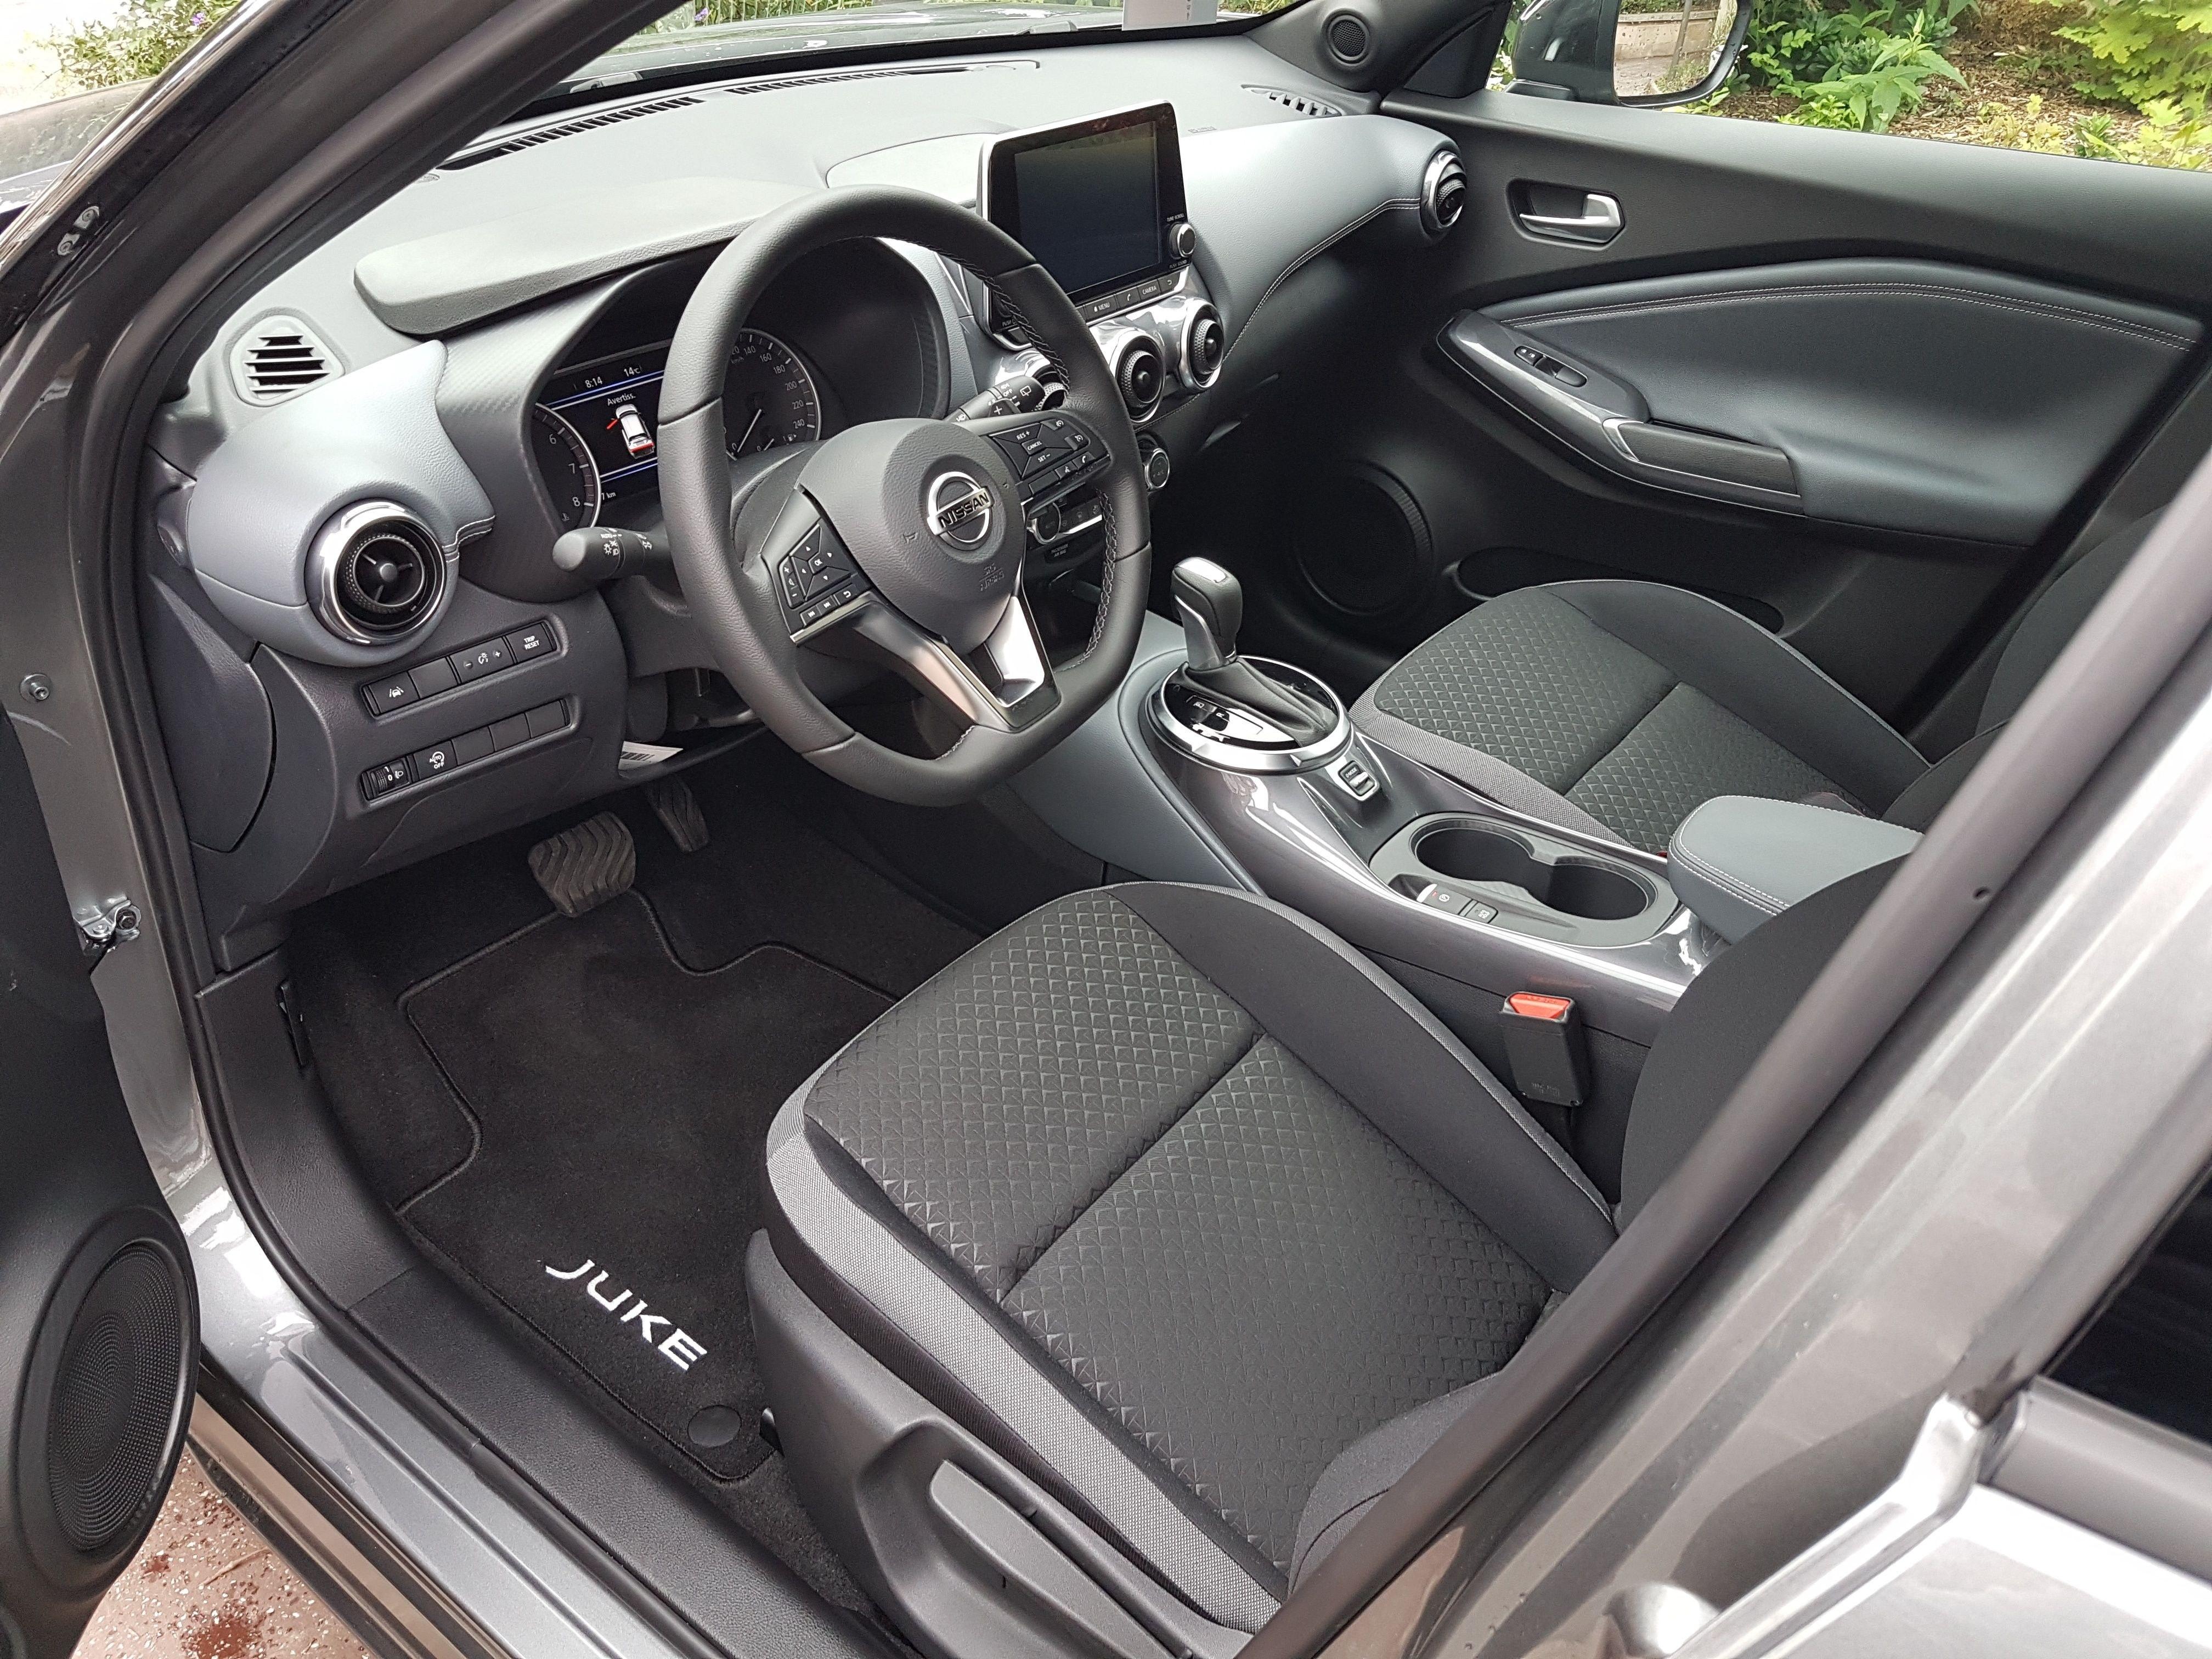 Mandataire auto Beauvais Haut De France Nissan Juke NconnectA 1.0 Digt 117cv Dct 3